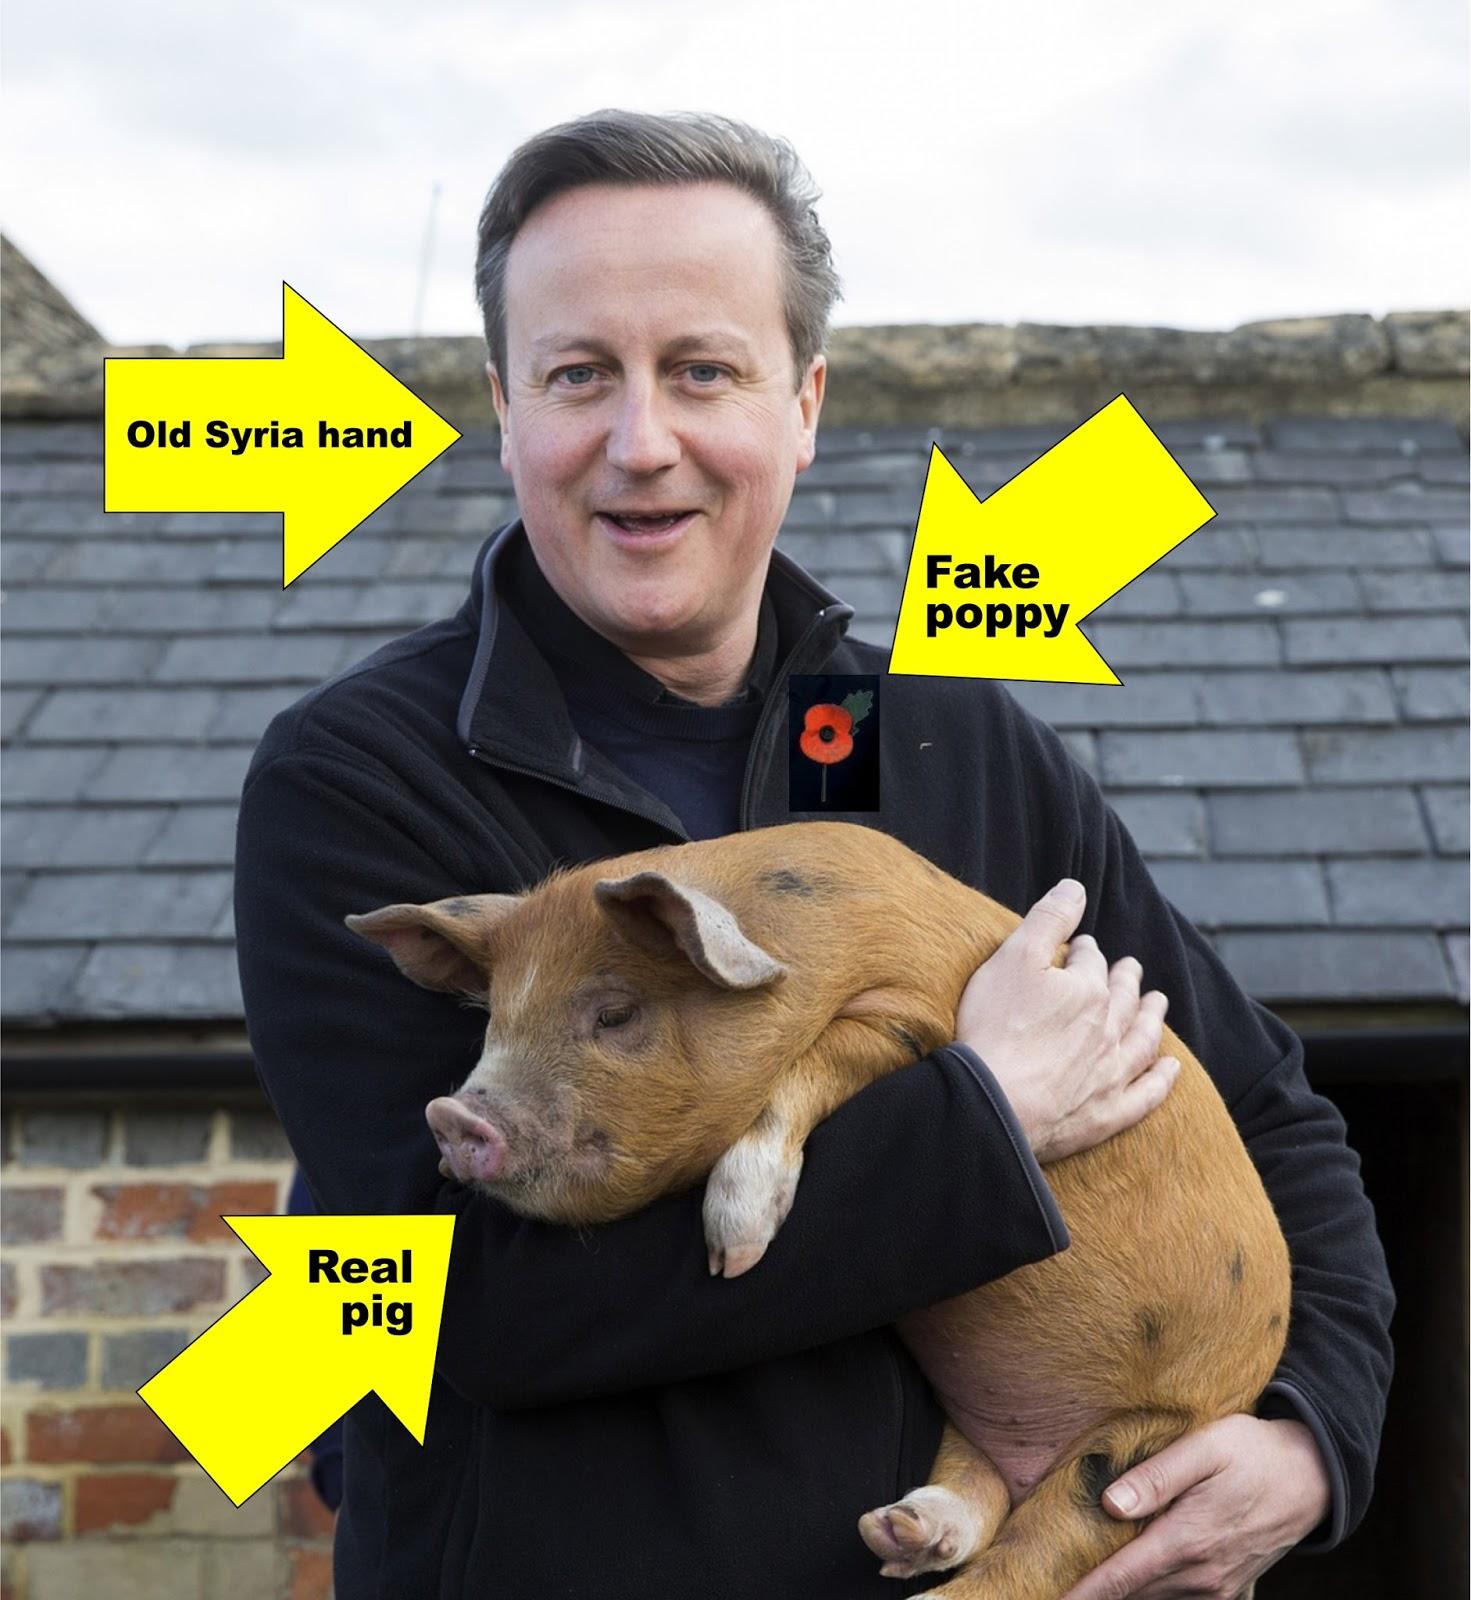 http://www.theguardian.com/politics/2015/nov/02/poppy-photoshopped-david-cameron-facebook-picture